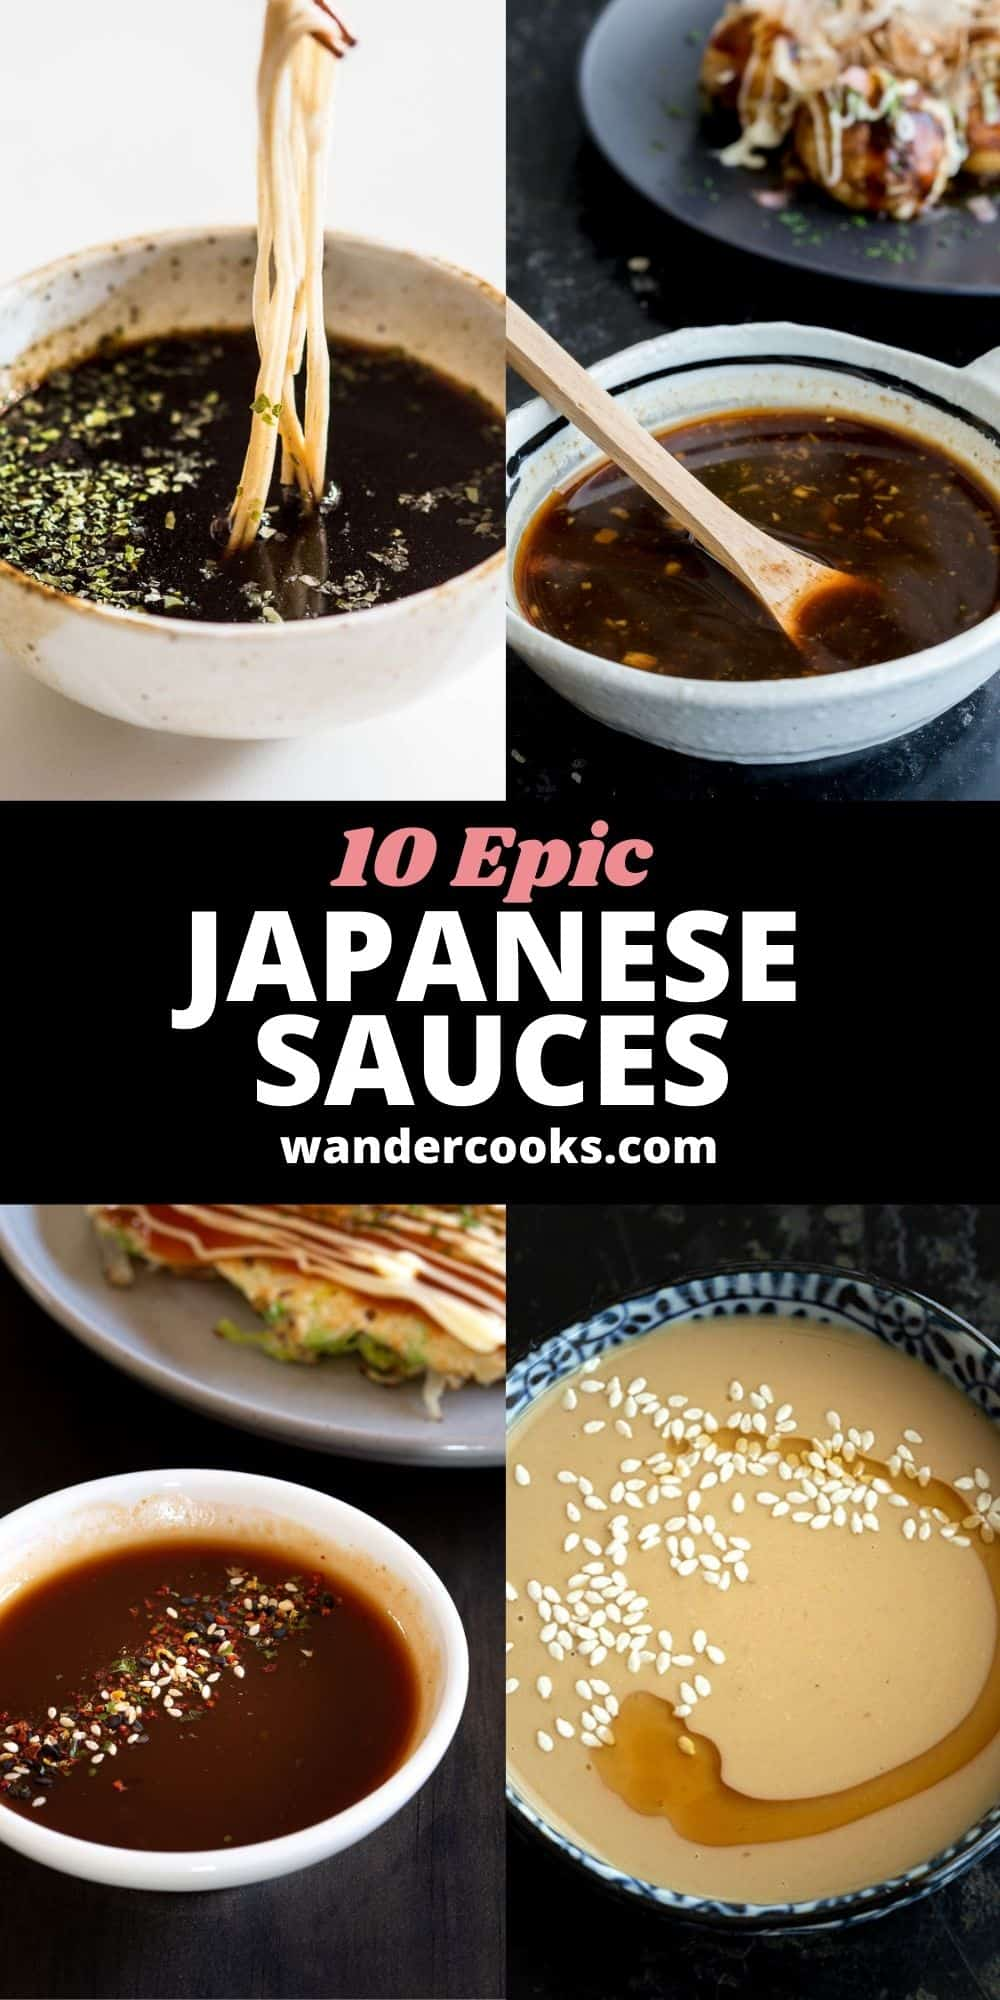 10 Epic Japanese Sauces Anyone Can Make At Home